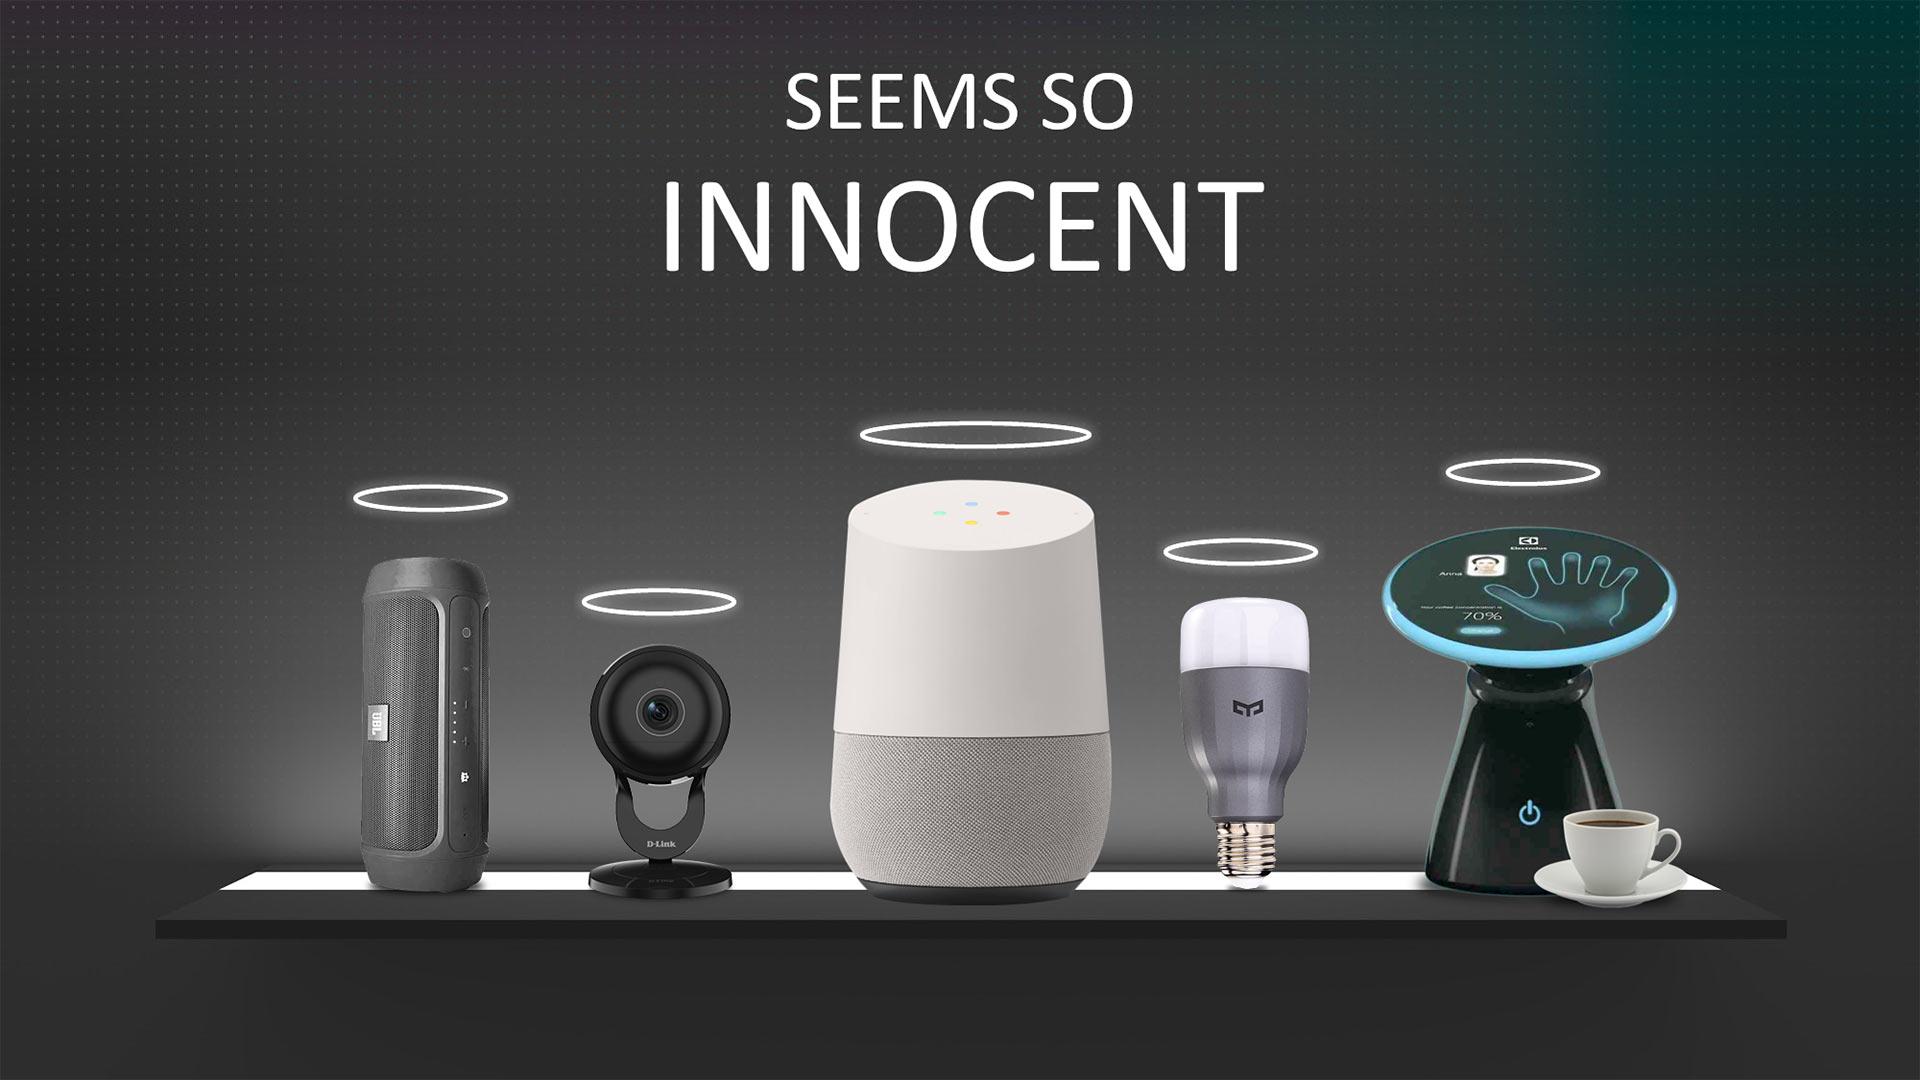 inocent2.jpg